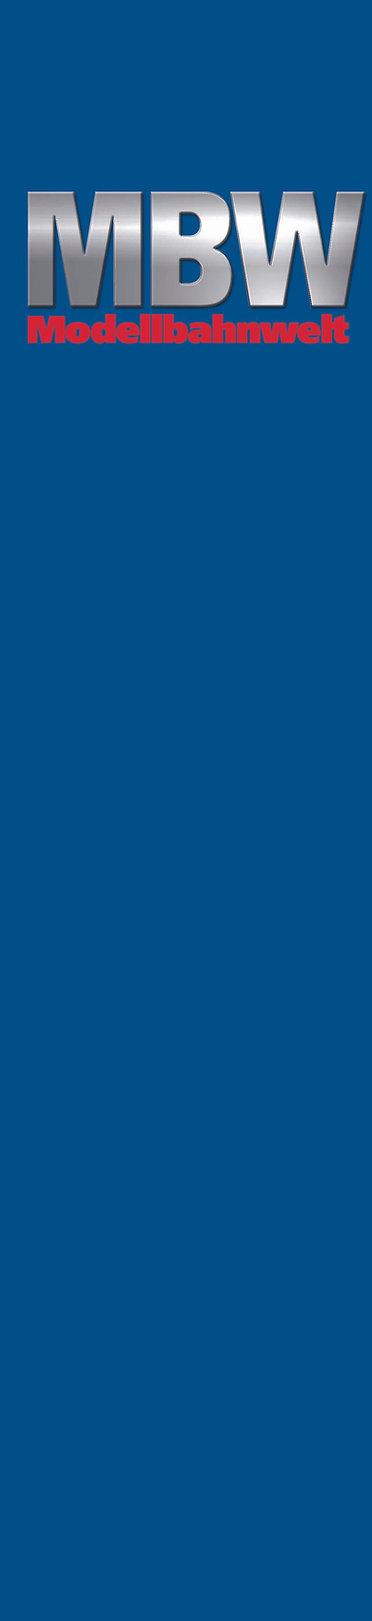 MBW-Logo.jpg